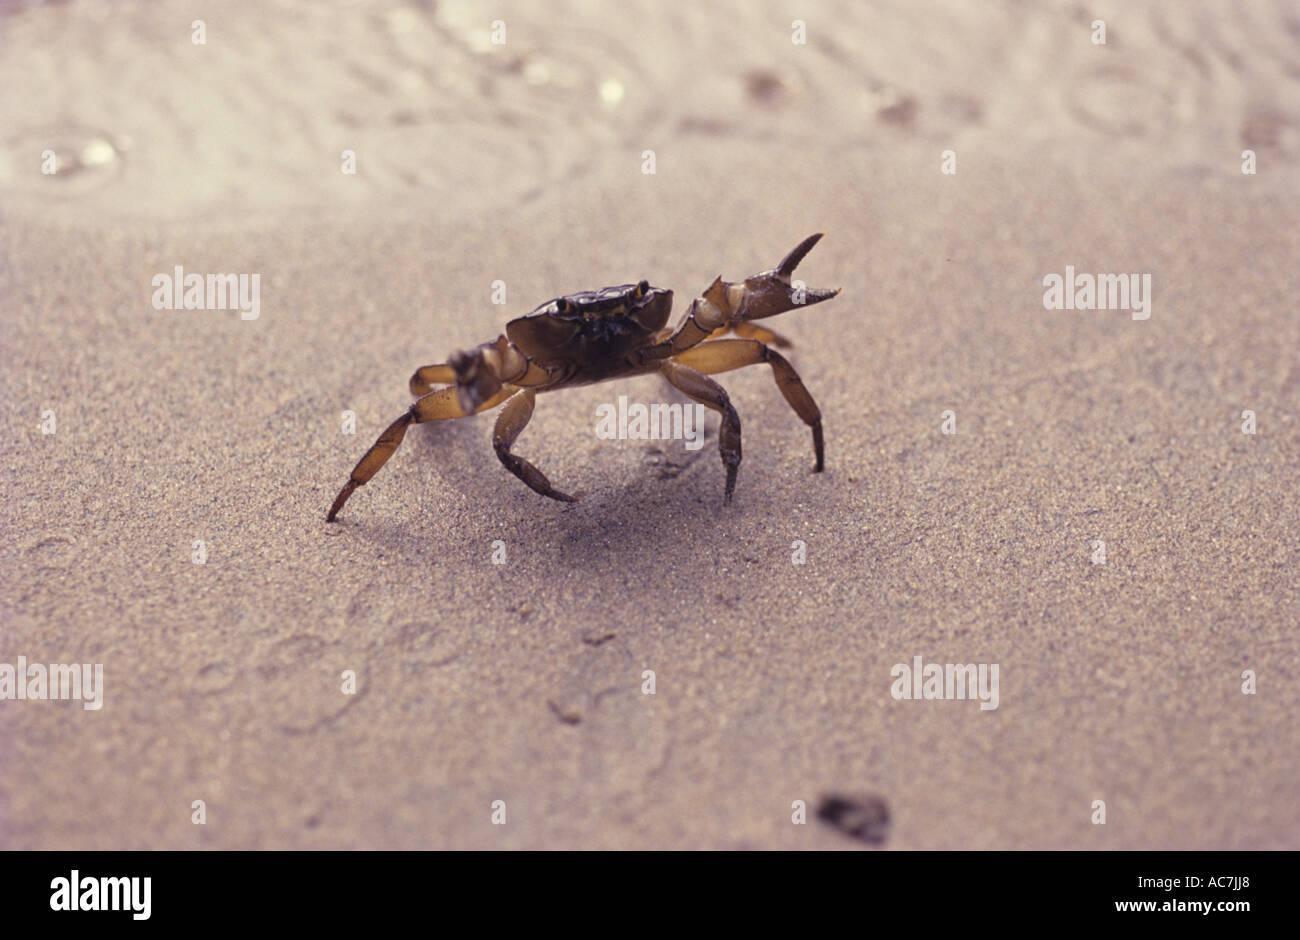 CRAB ON DEFENSIVE POSE AT BANGARAM BEACH - Stock Image